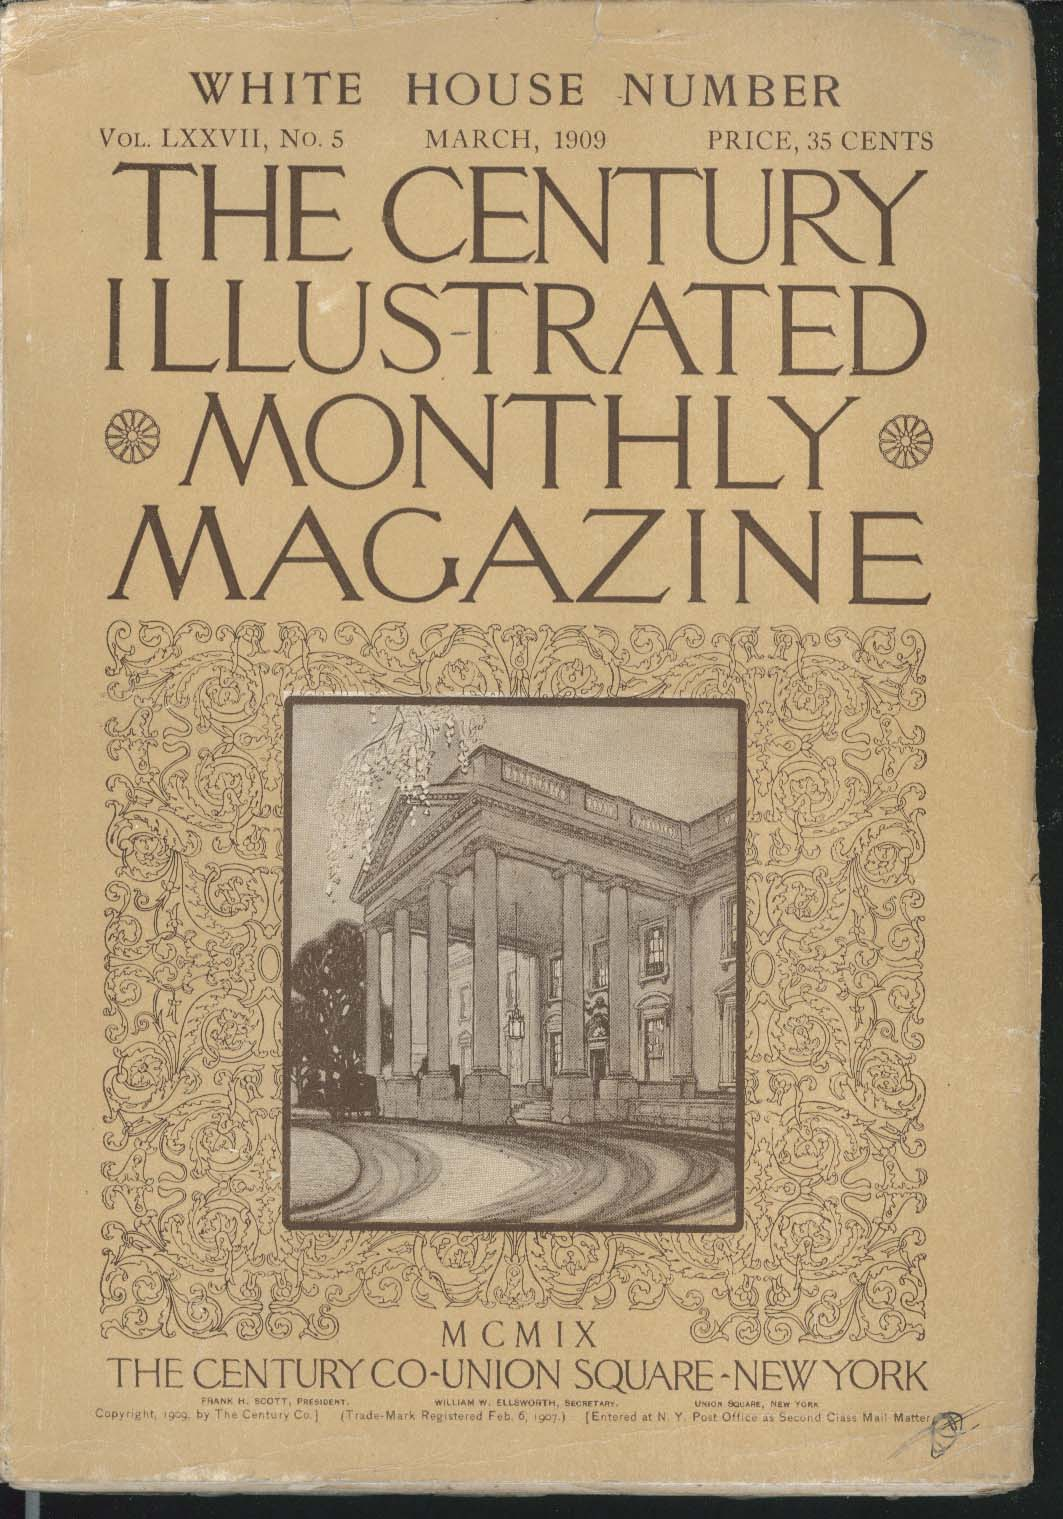 CENTURY ILLUSTRATED MONTHLY MAGAZINE Margarita Spalding Gerry Pres Hayes 3 1909